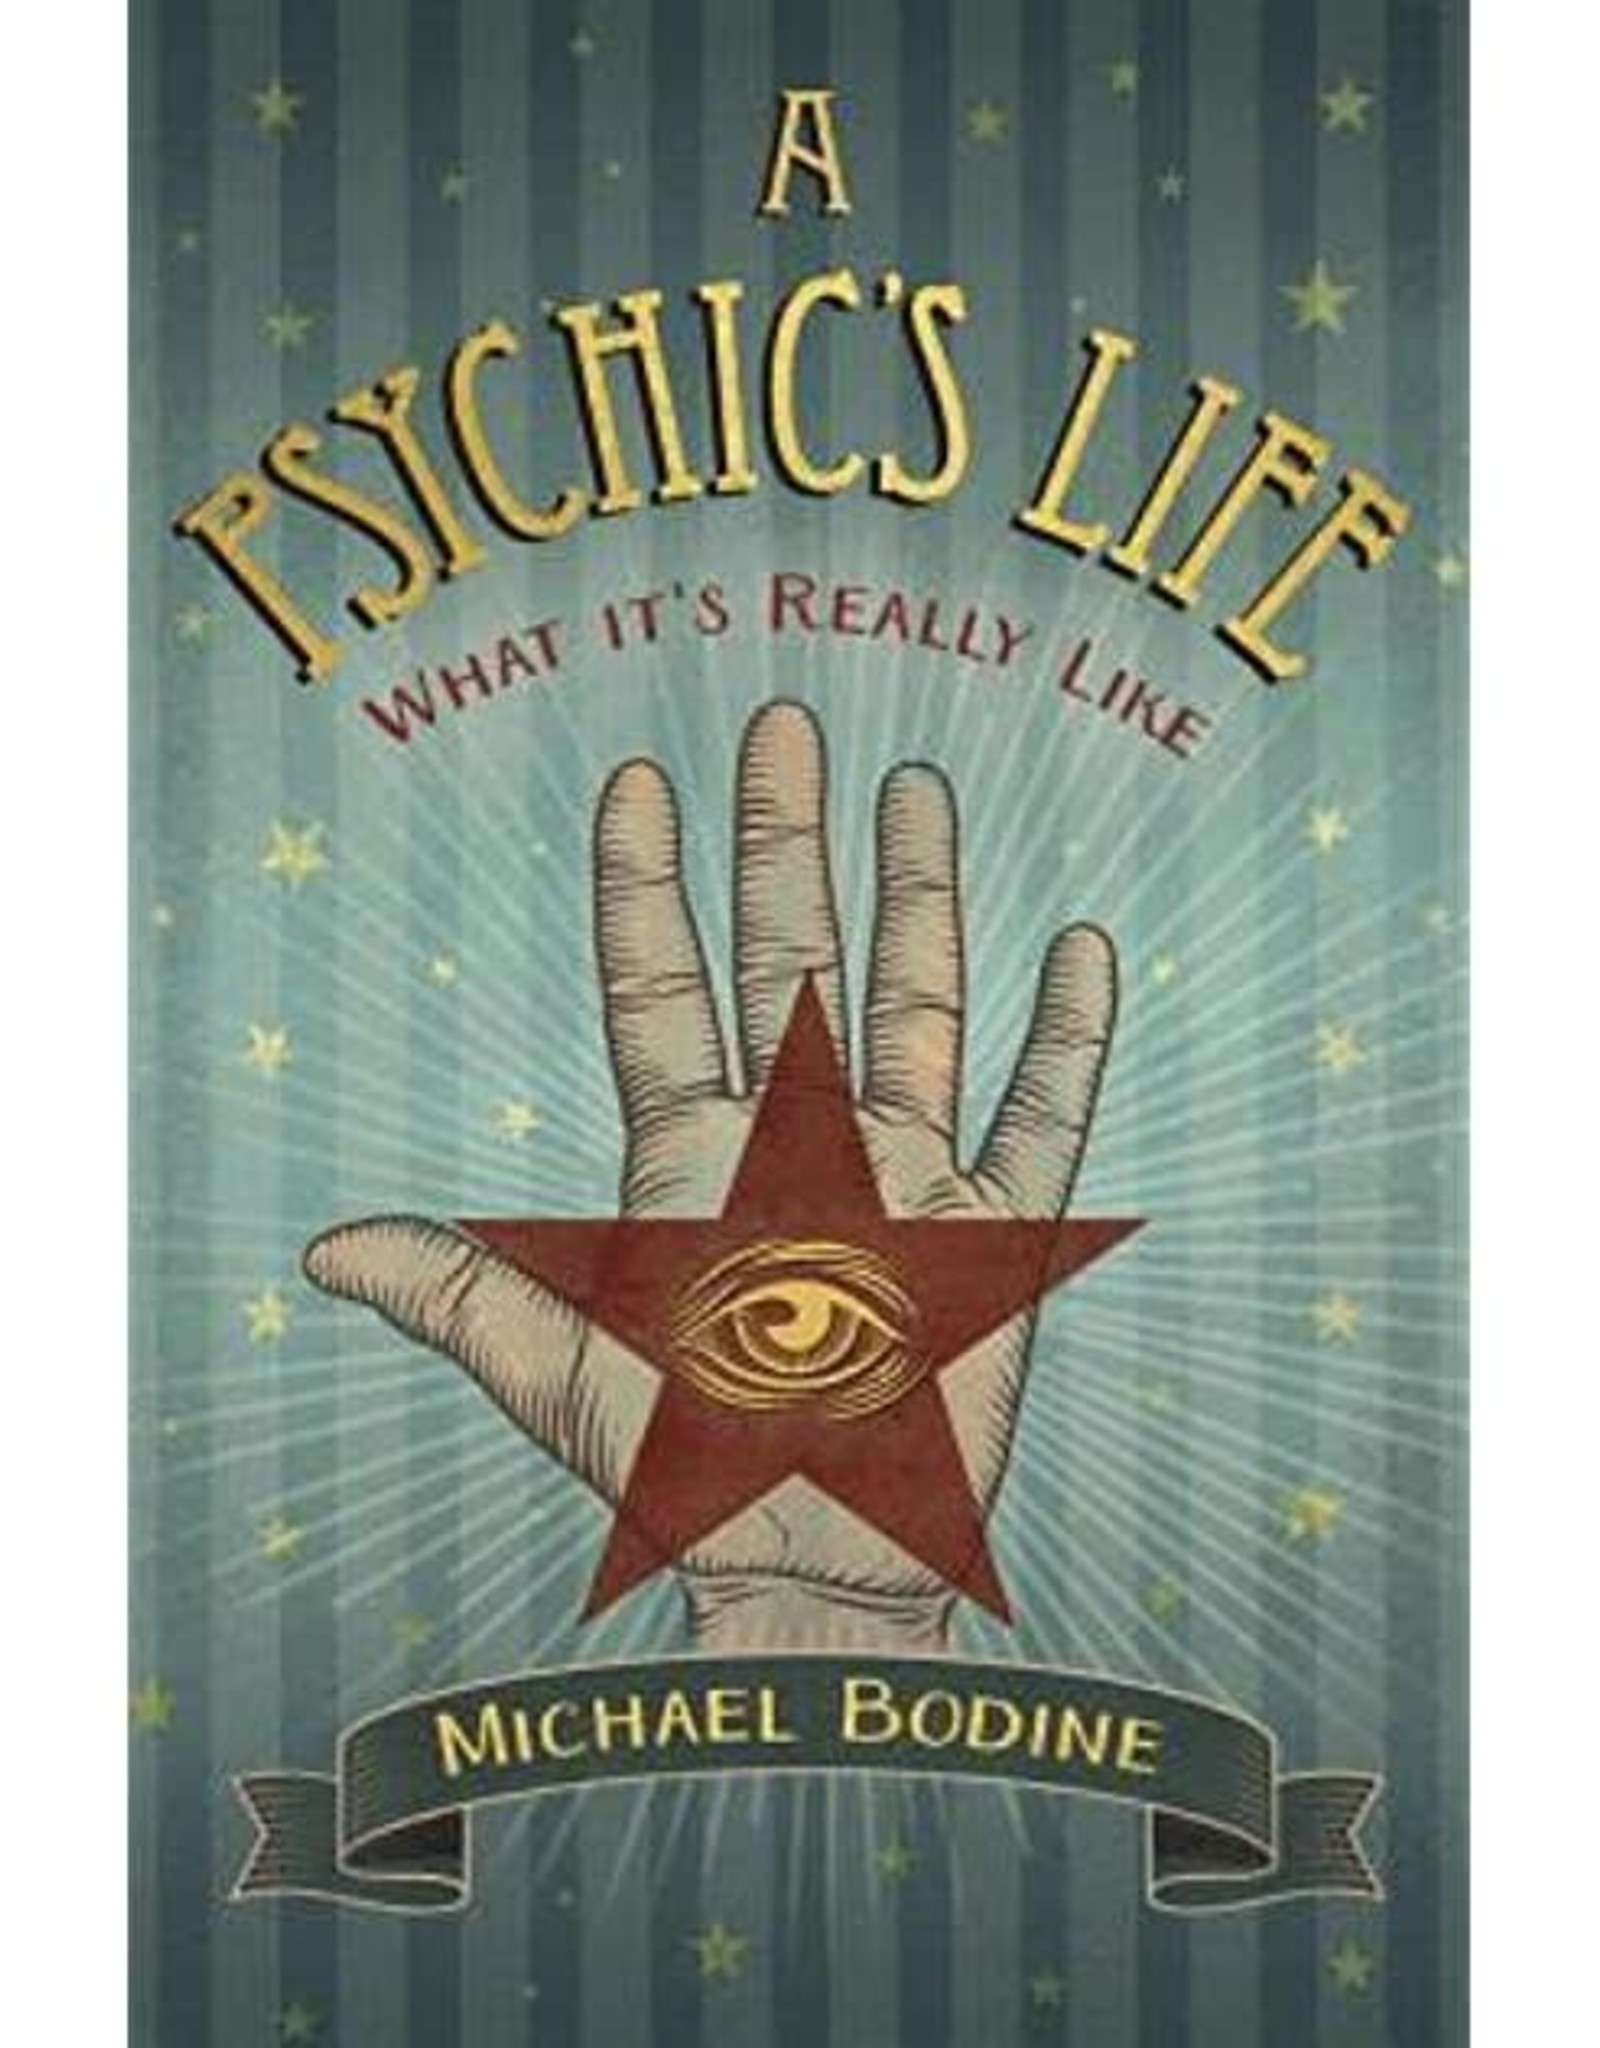 Michael Bodine A Psychic's Life by Michael Bodine